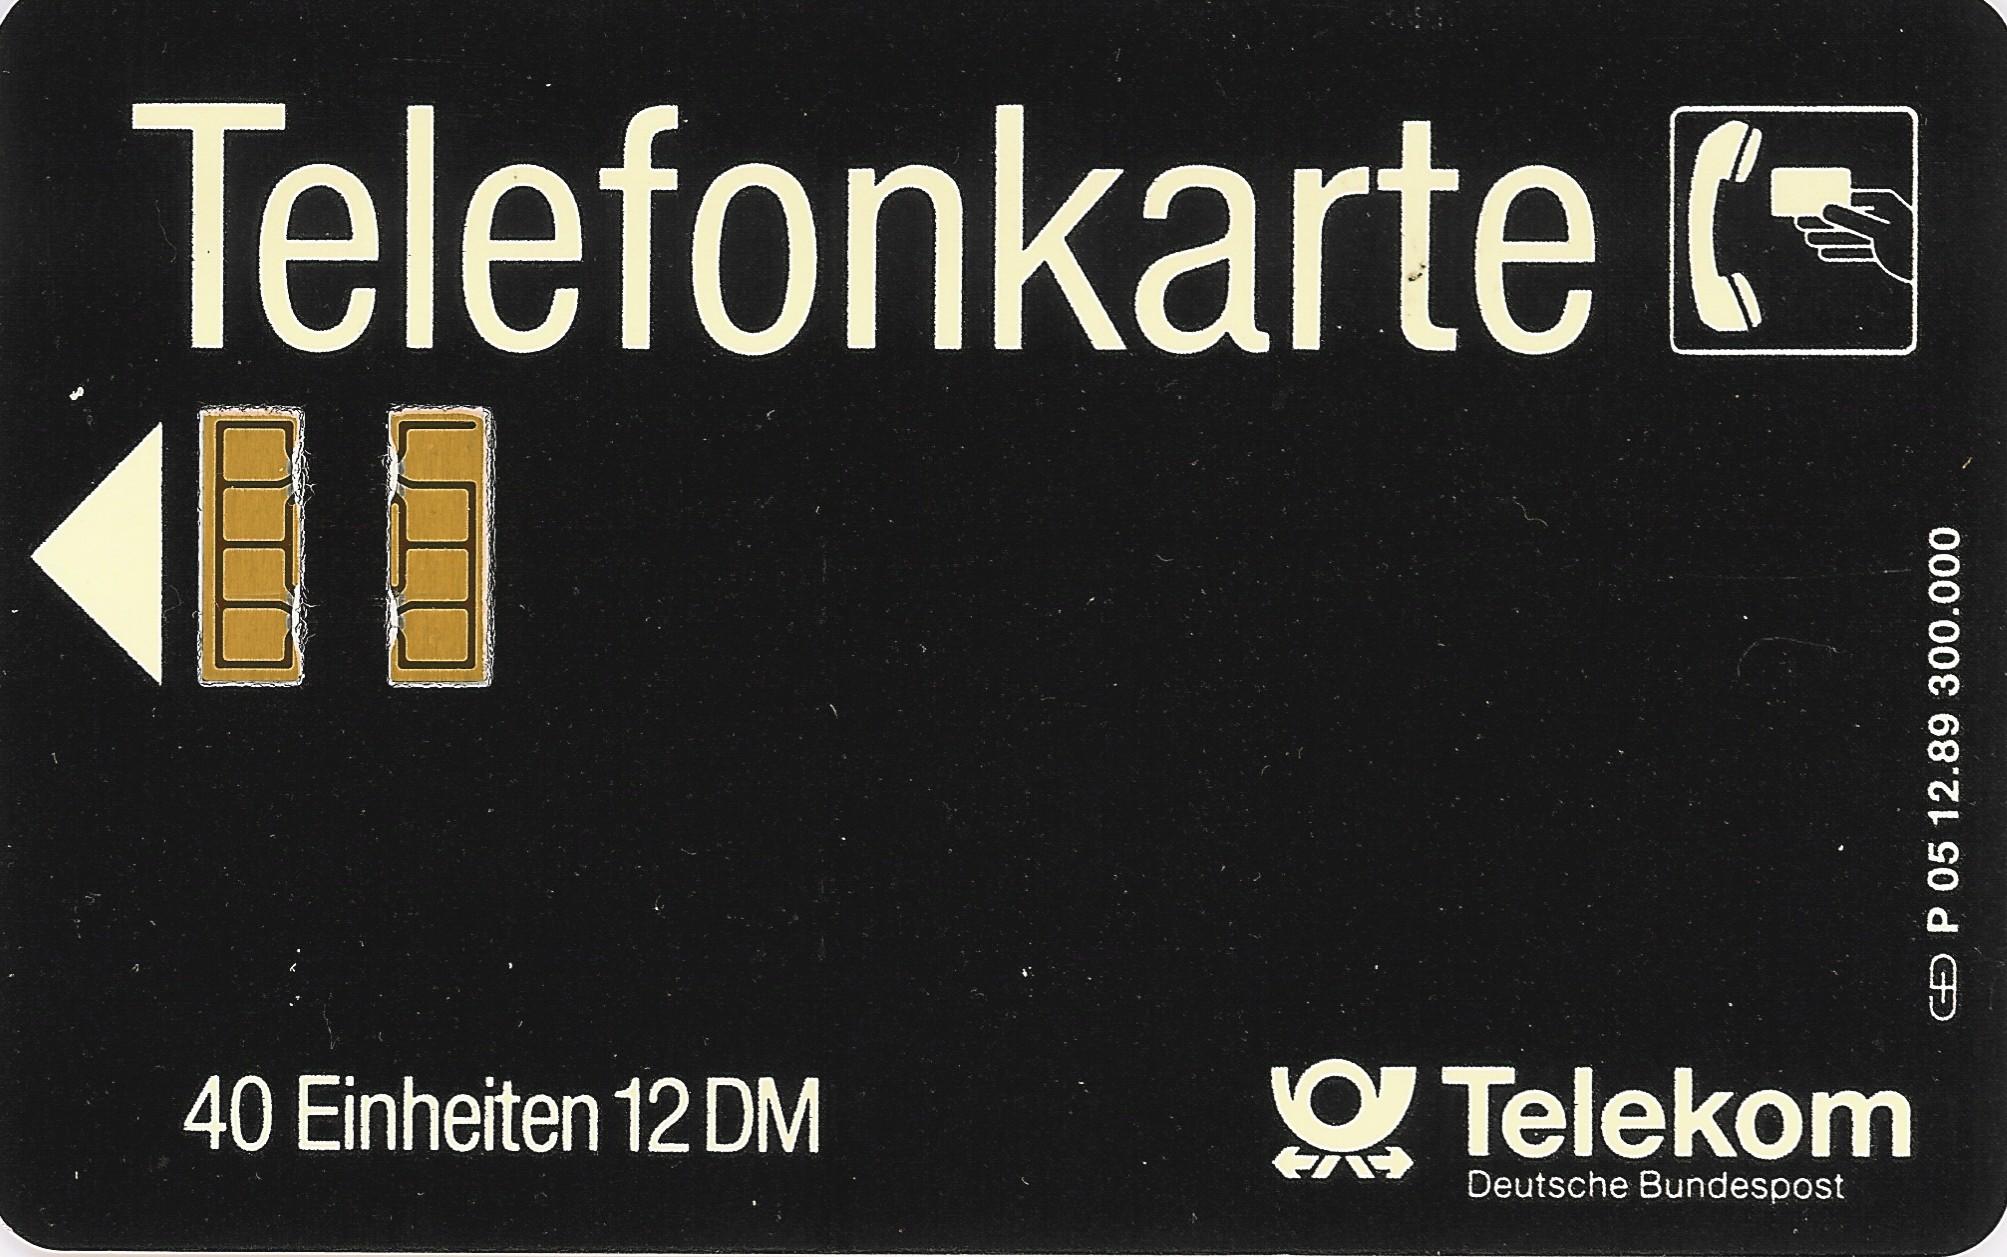 Tarjeta Telefonkarte. Deutsche Telekom